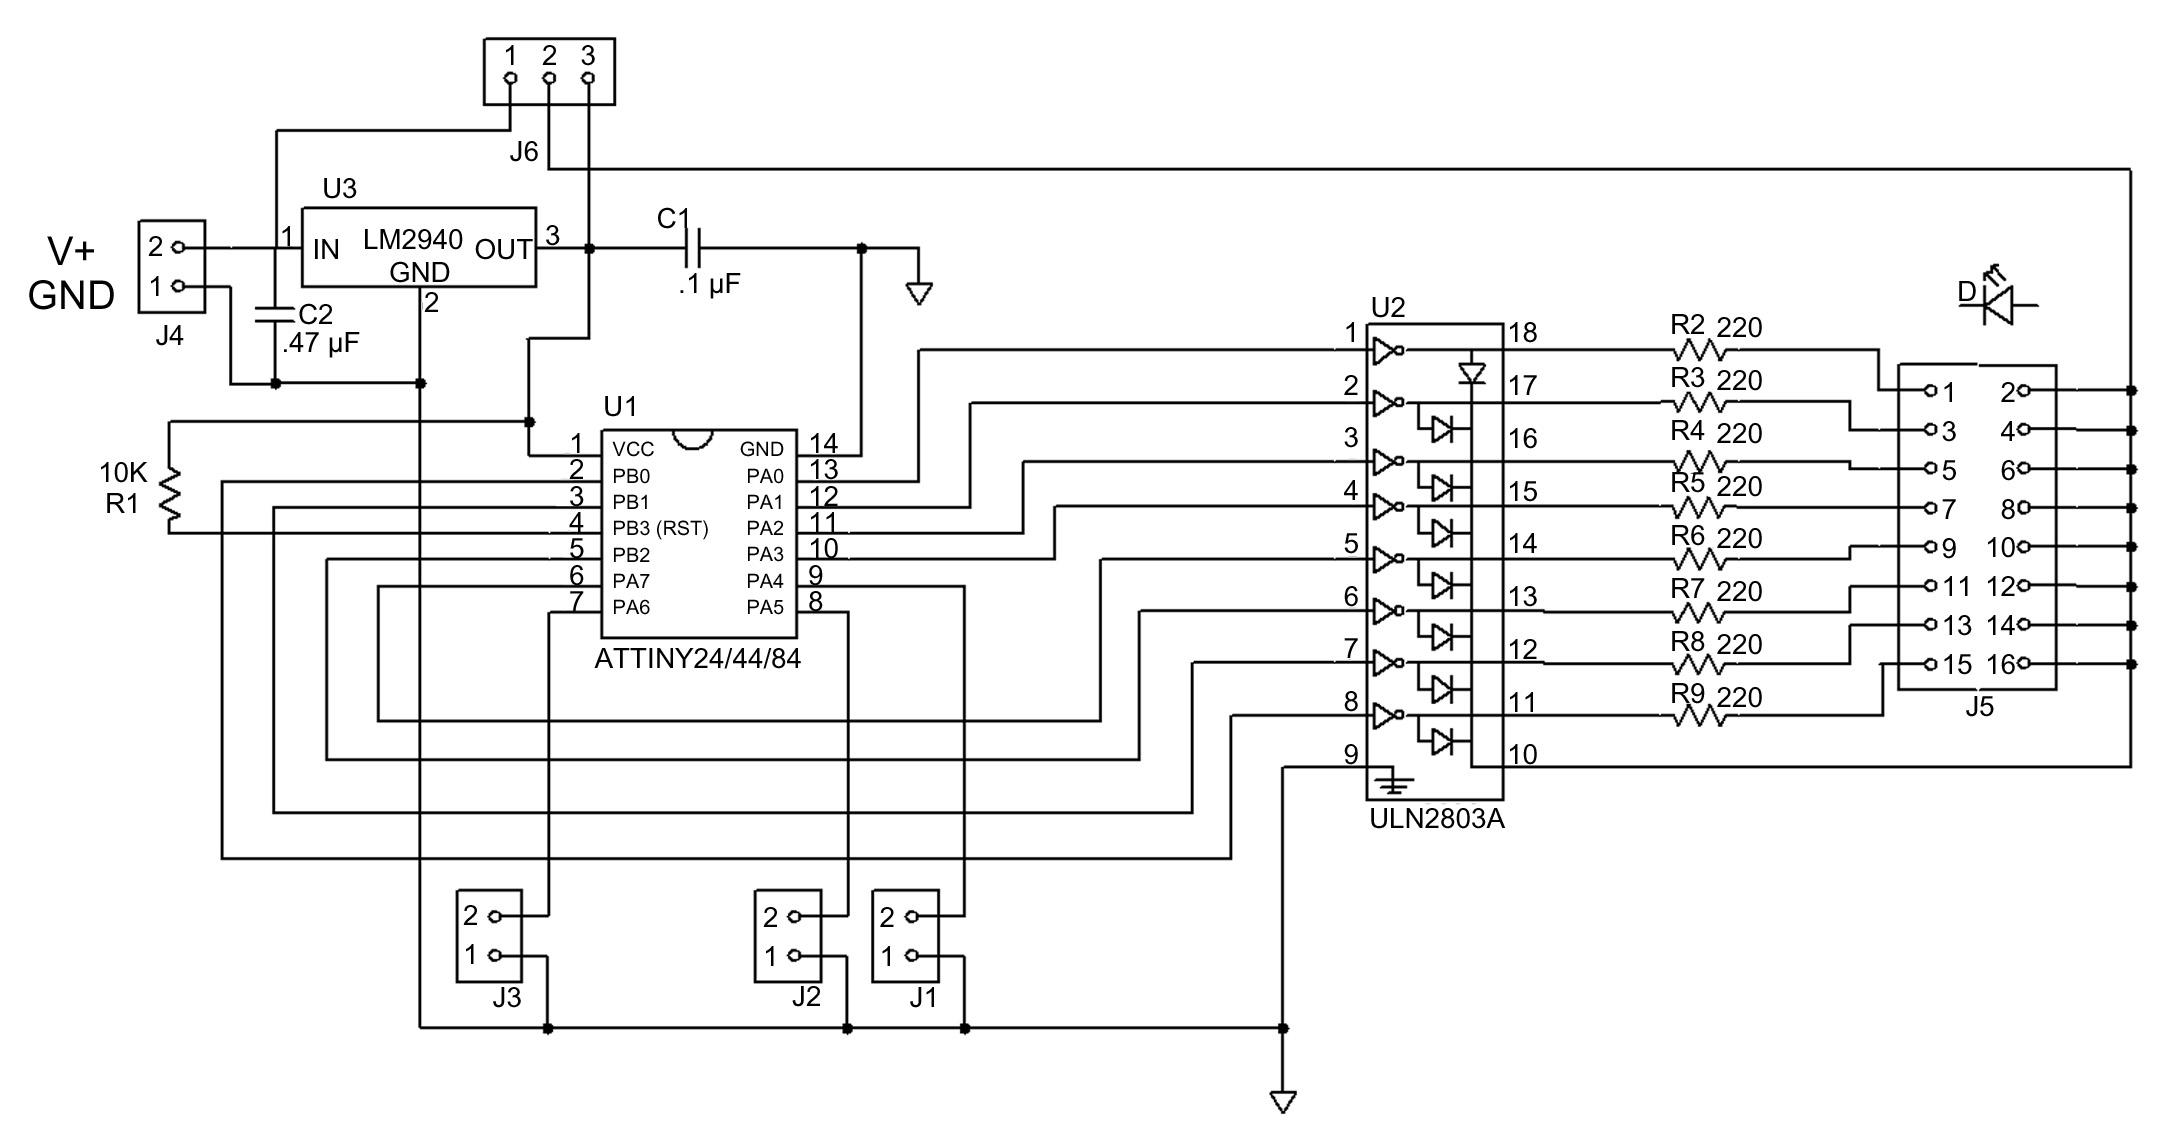 Berühmt 3 Gang Ventilatormotor Schaltplan 110v Fotos - Elektrische ...